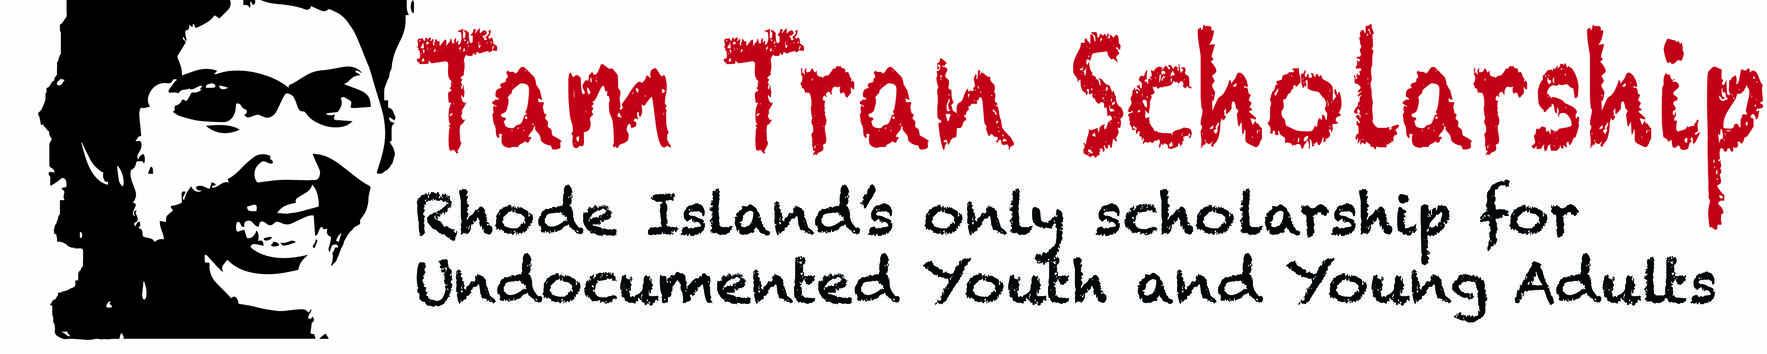 Tam Tran Scholarship Fund | Fundraiser image